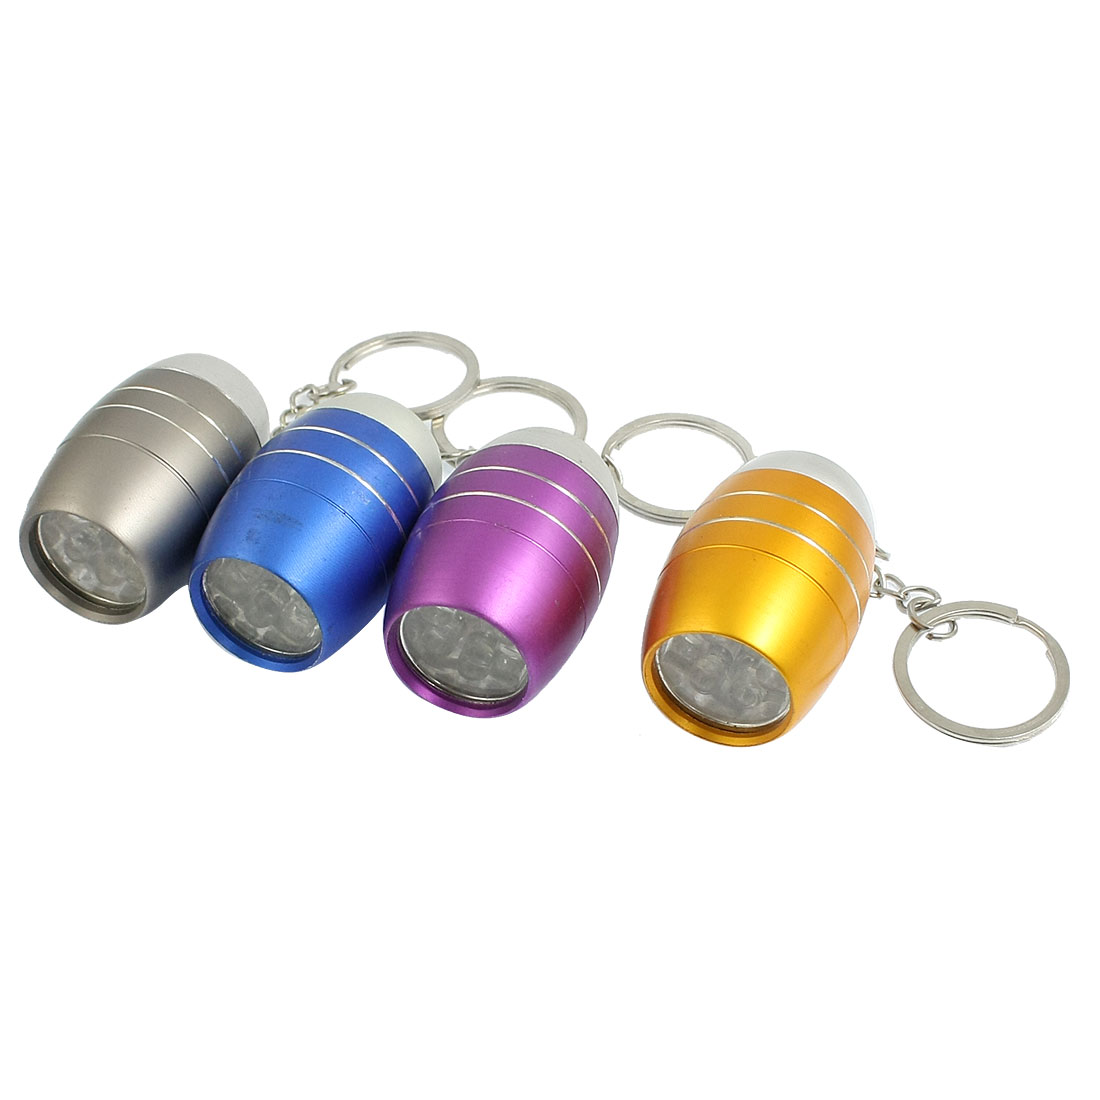 4Pcs Outdoor Camping White 6 LED Aluminum Mini Flashlight Torch